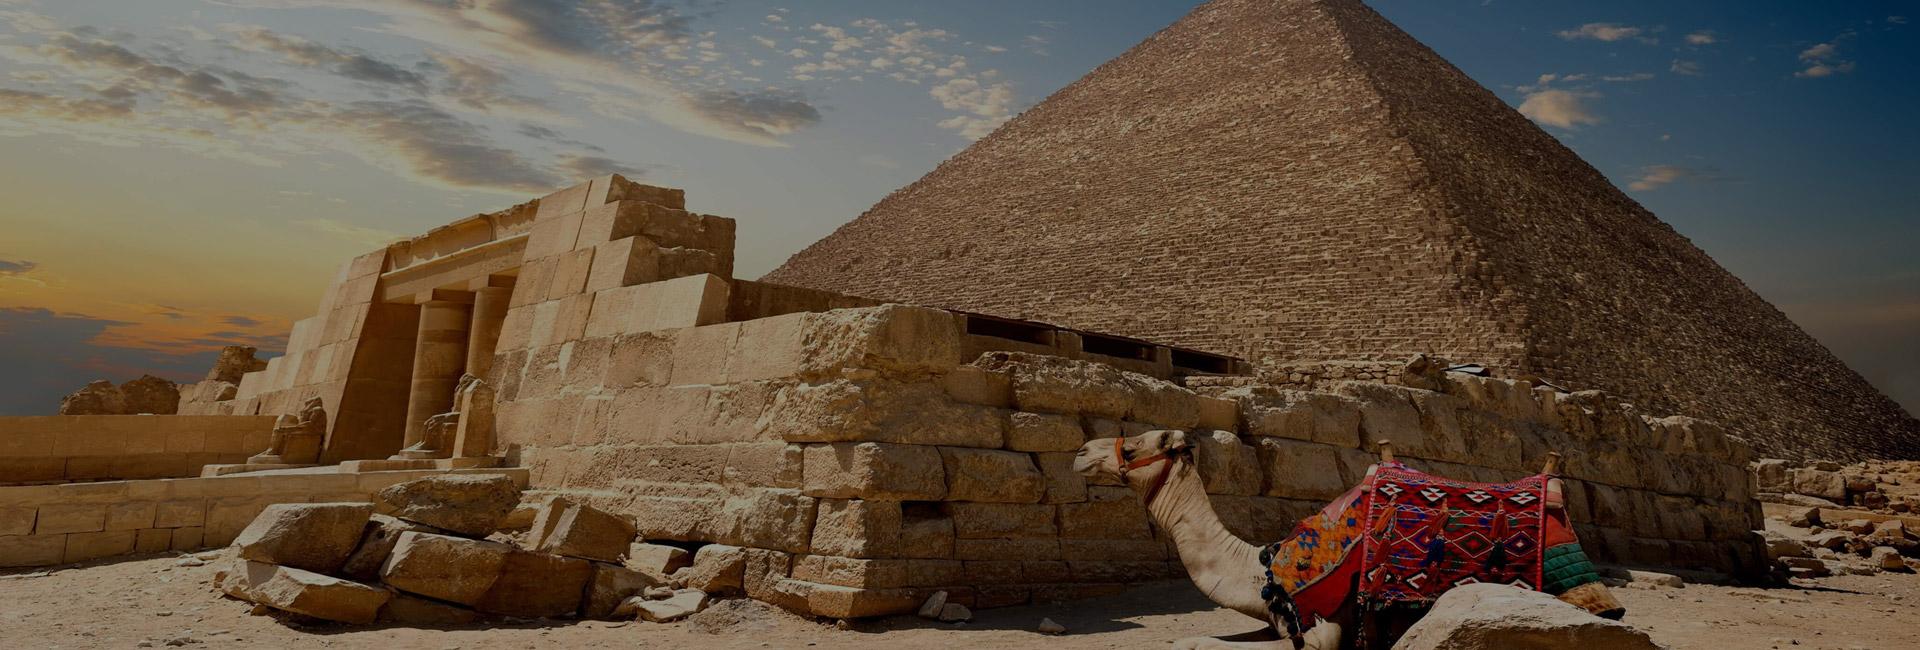 Pyramids the Nile and Sharm El Sheikh